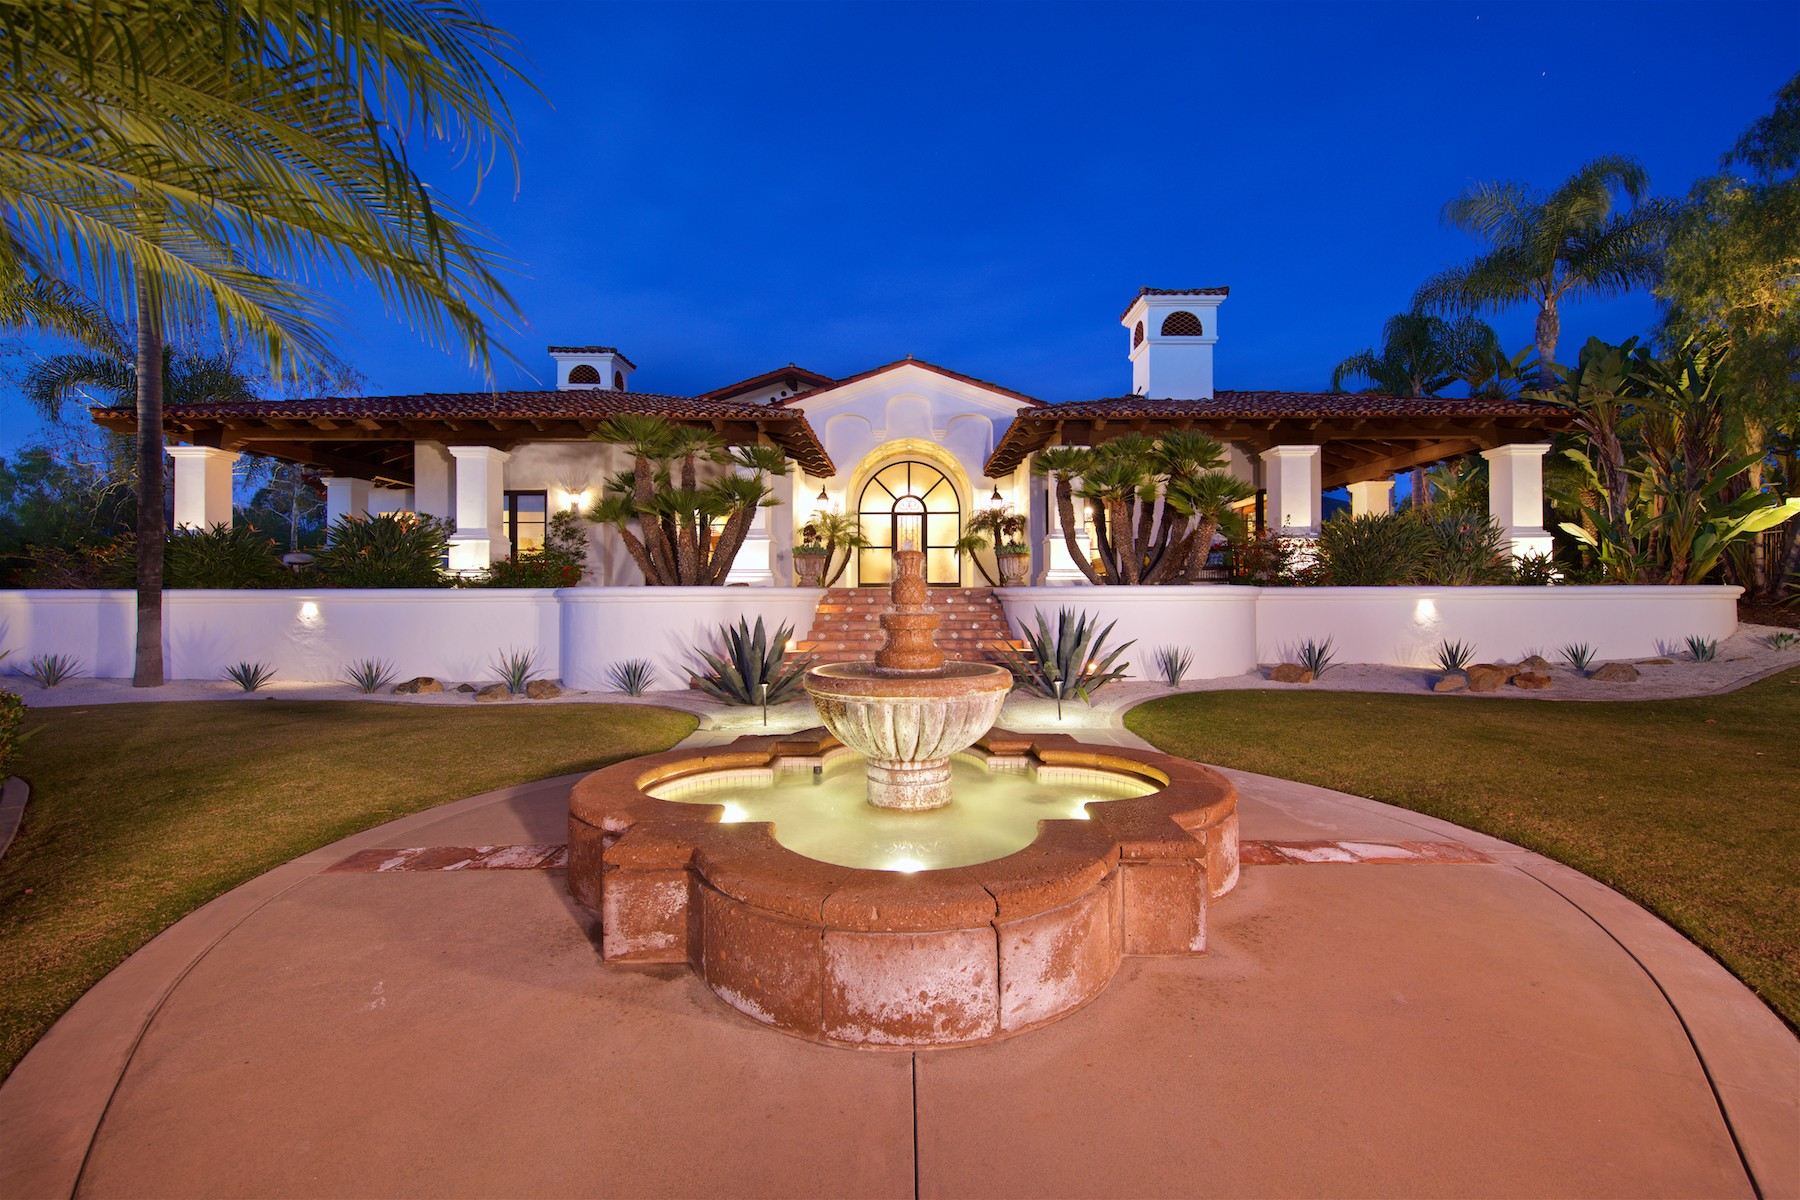 Single Family Home for Sale at 7152 Rancho La Cima Rancho Santa Fe, California 92067 United States